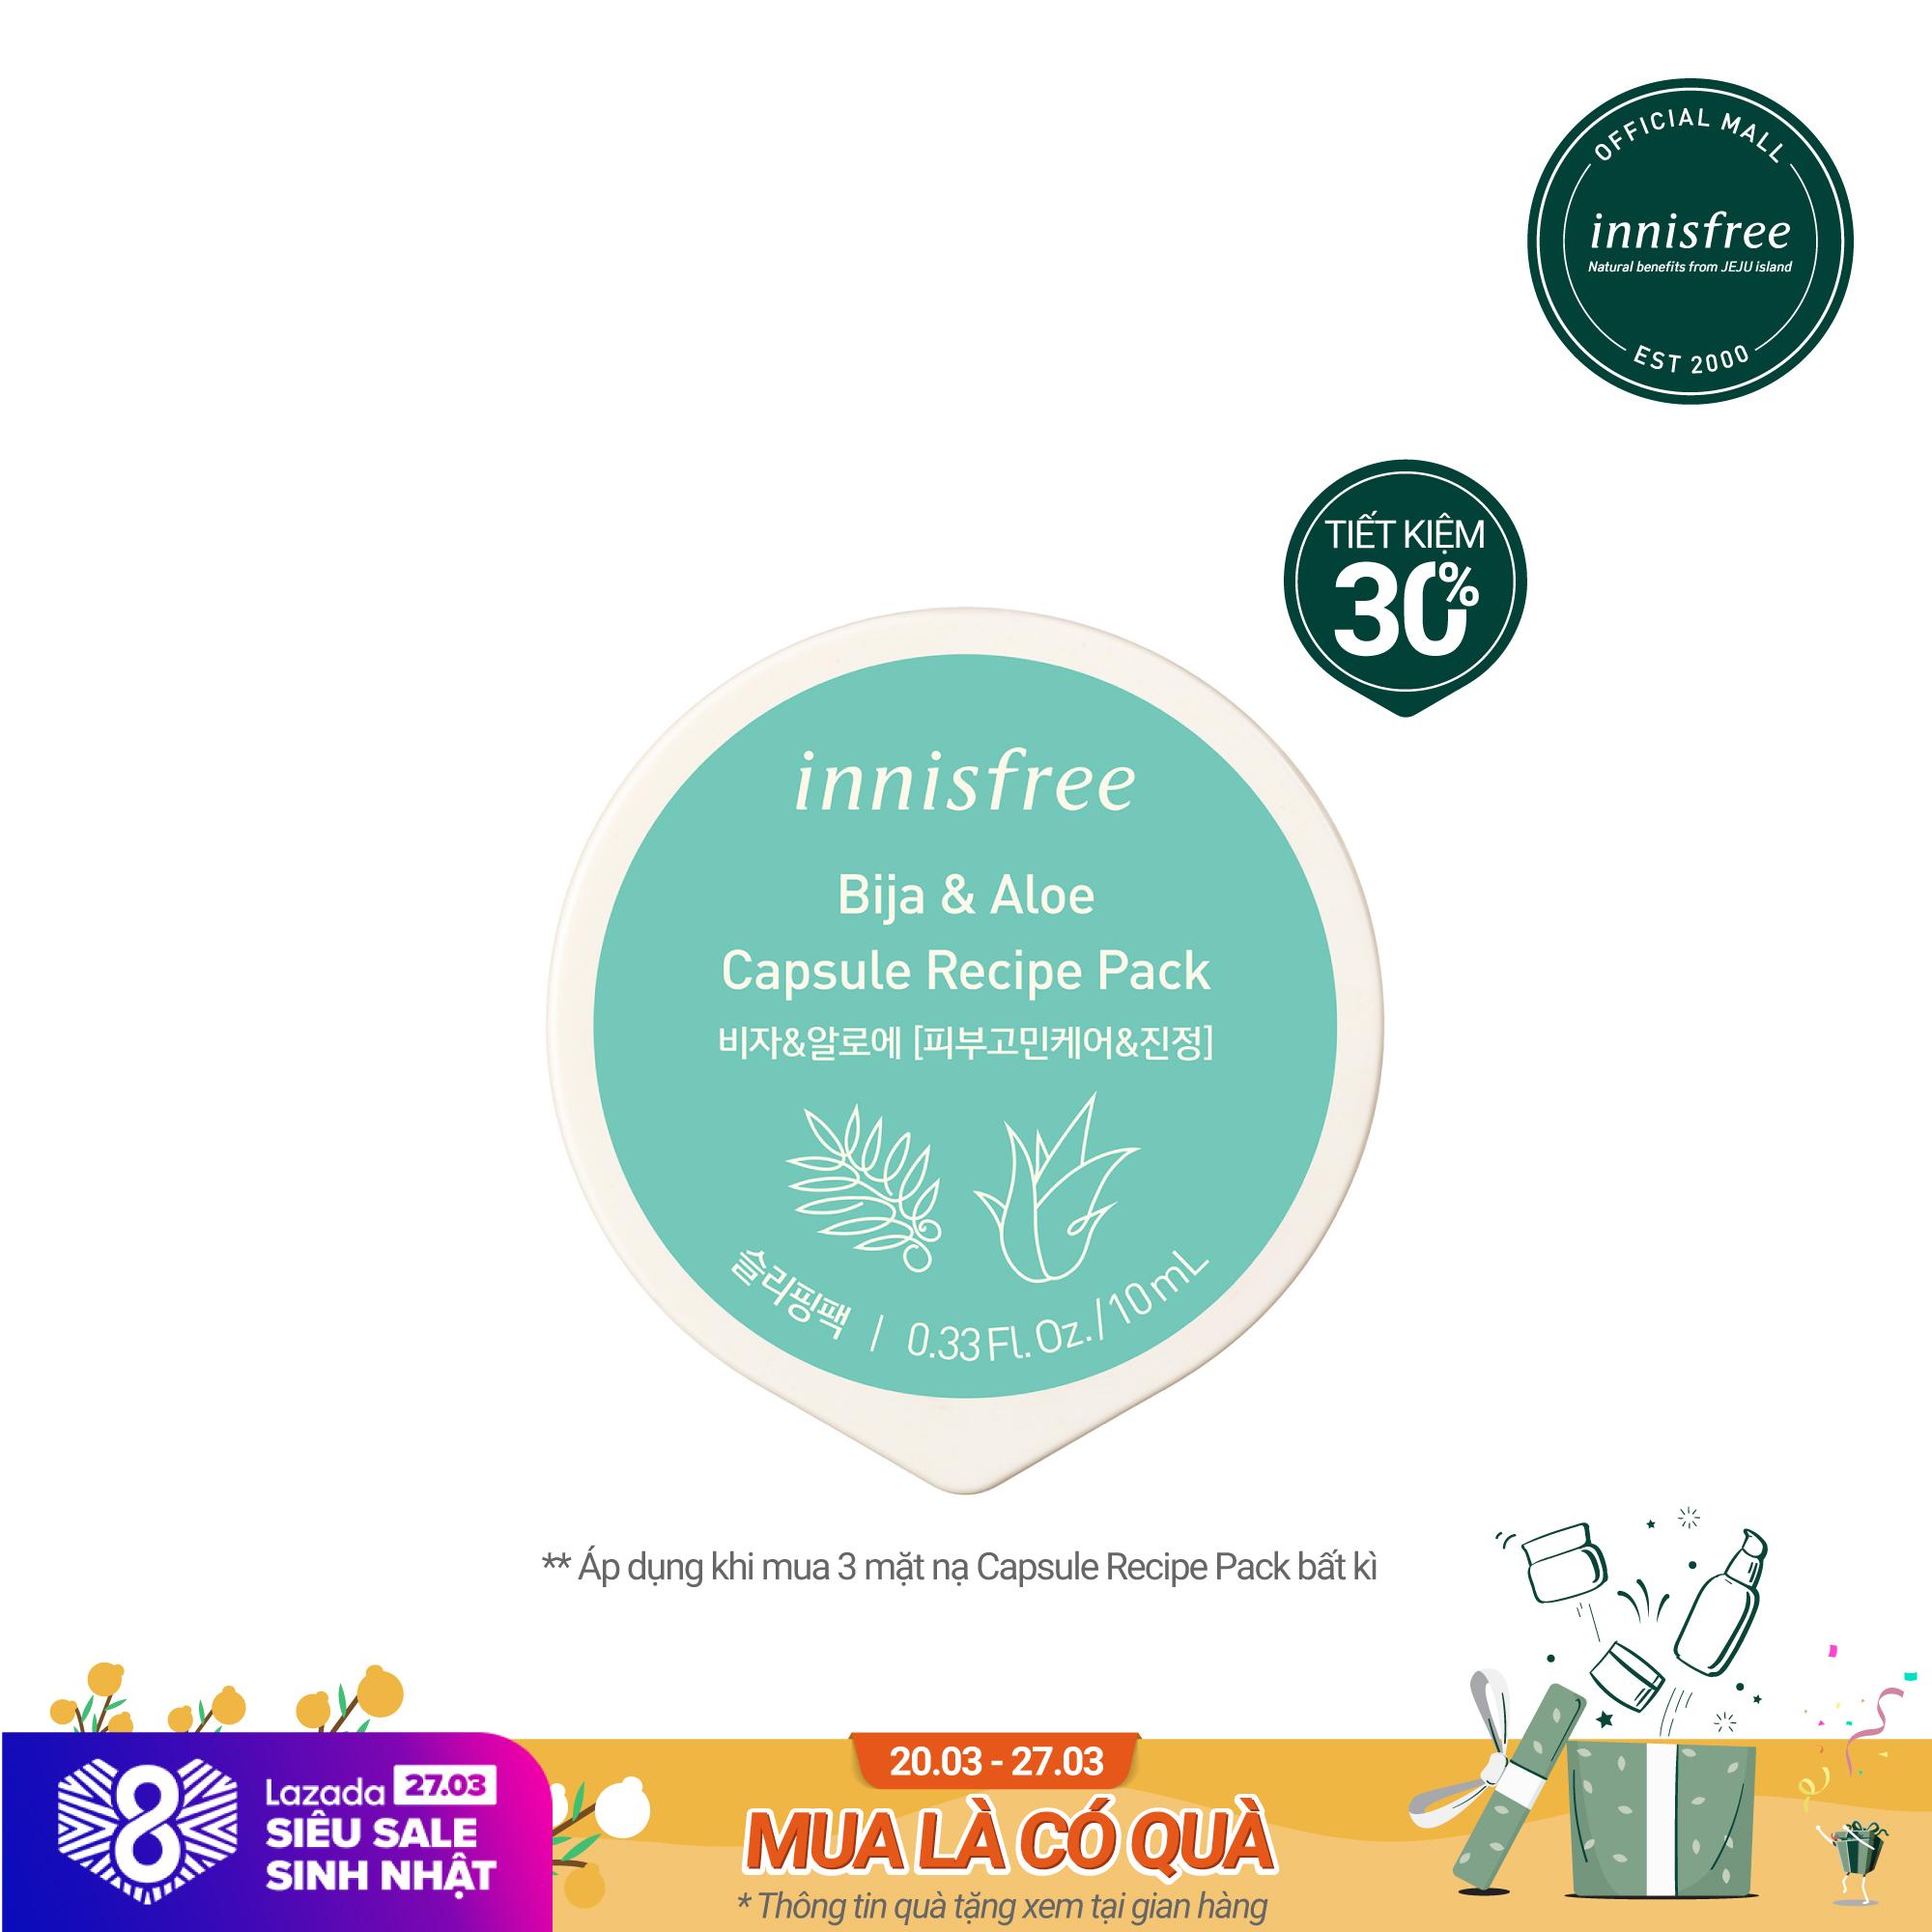 Mặt nạ ngủ dạng hủ từ bija & nha đam innisfree Capsule Recipe Pack Bija & Aloe 10ml cao cấp